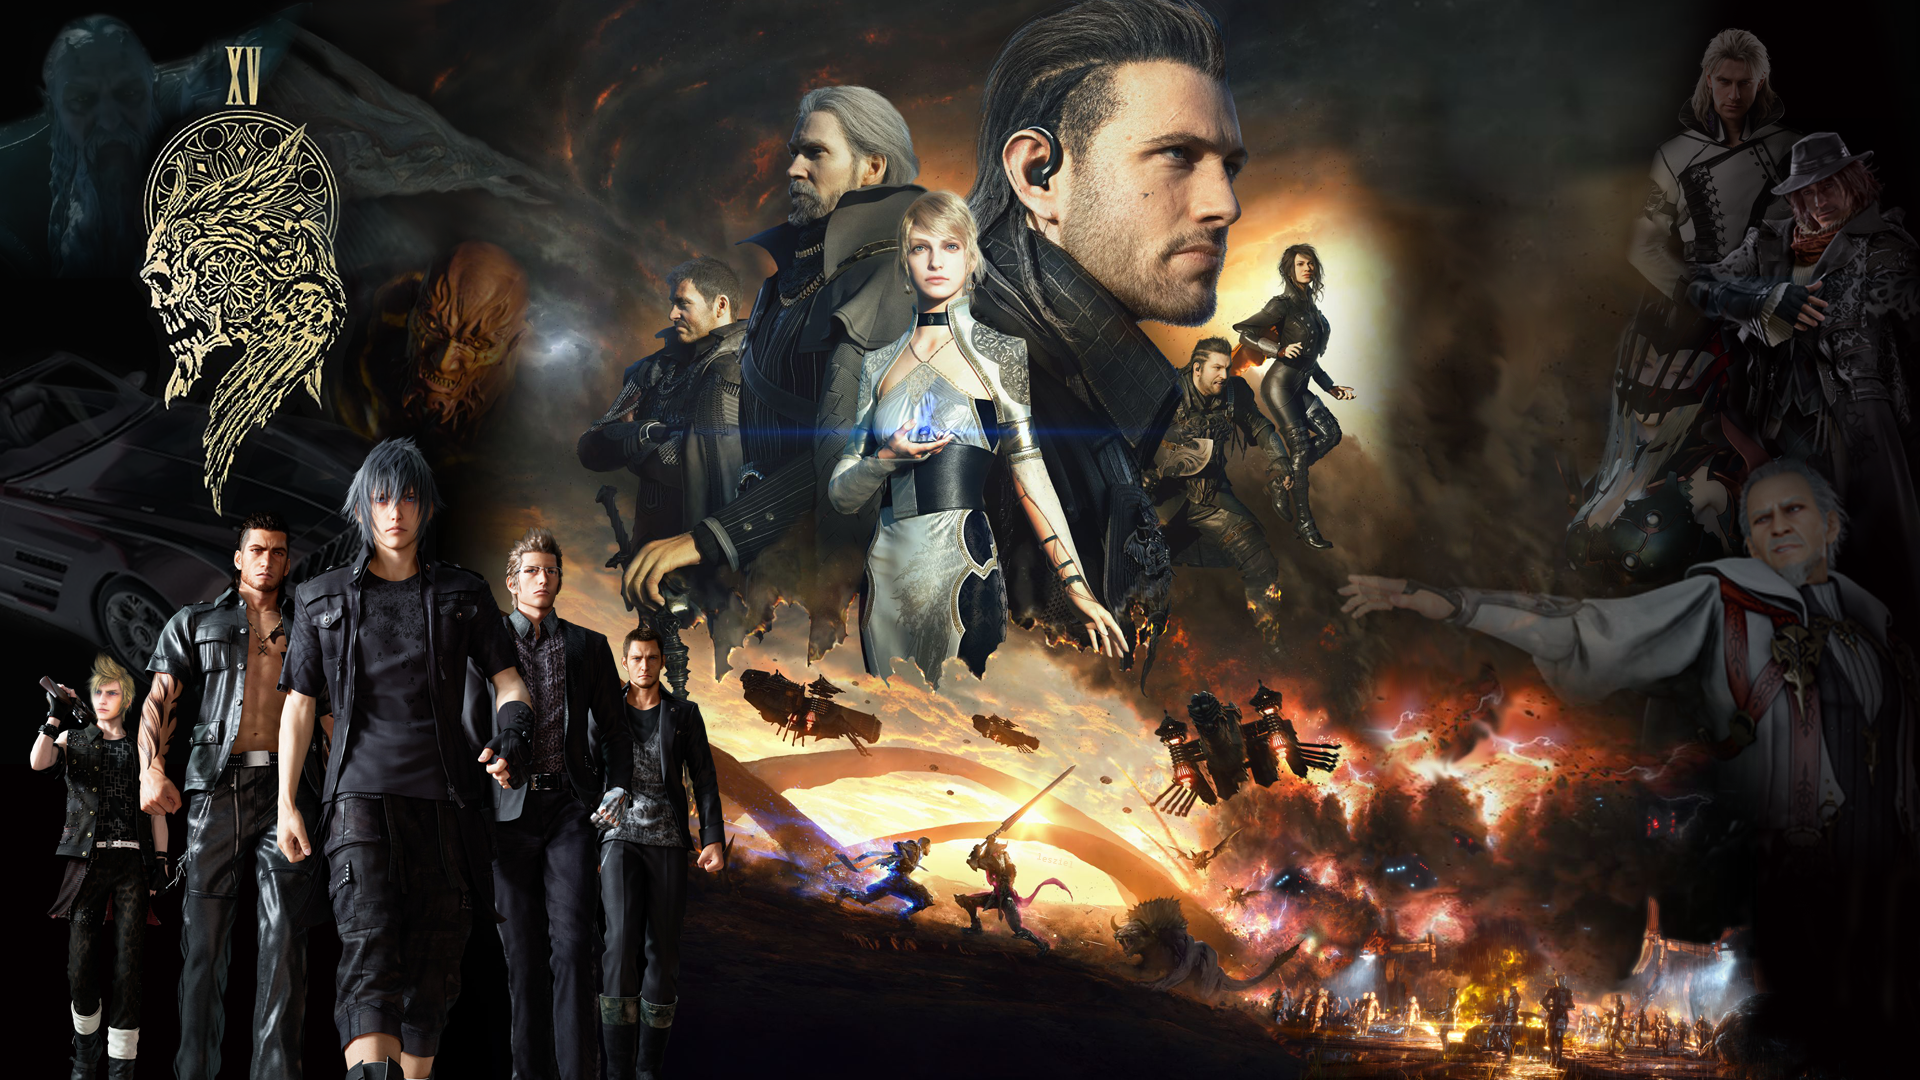 Final Fantasy Xv Universe Wallpaper 1080p By Realzeles On Deviantart